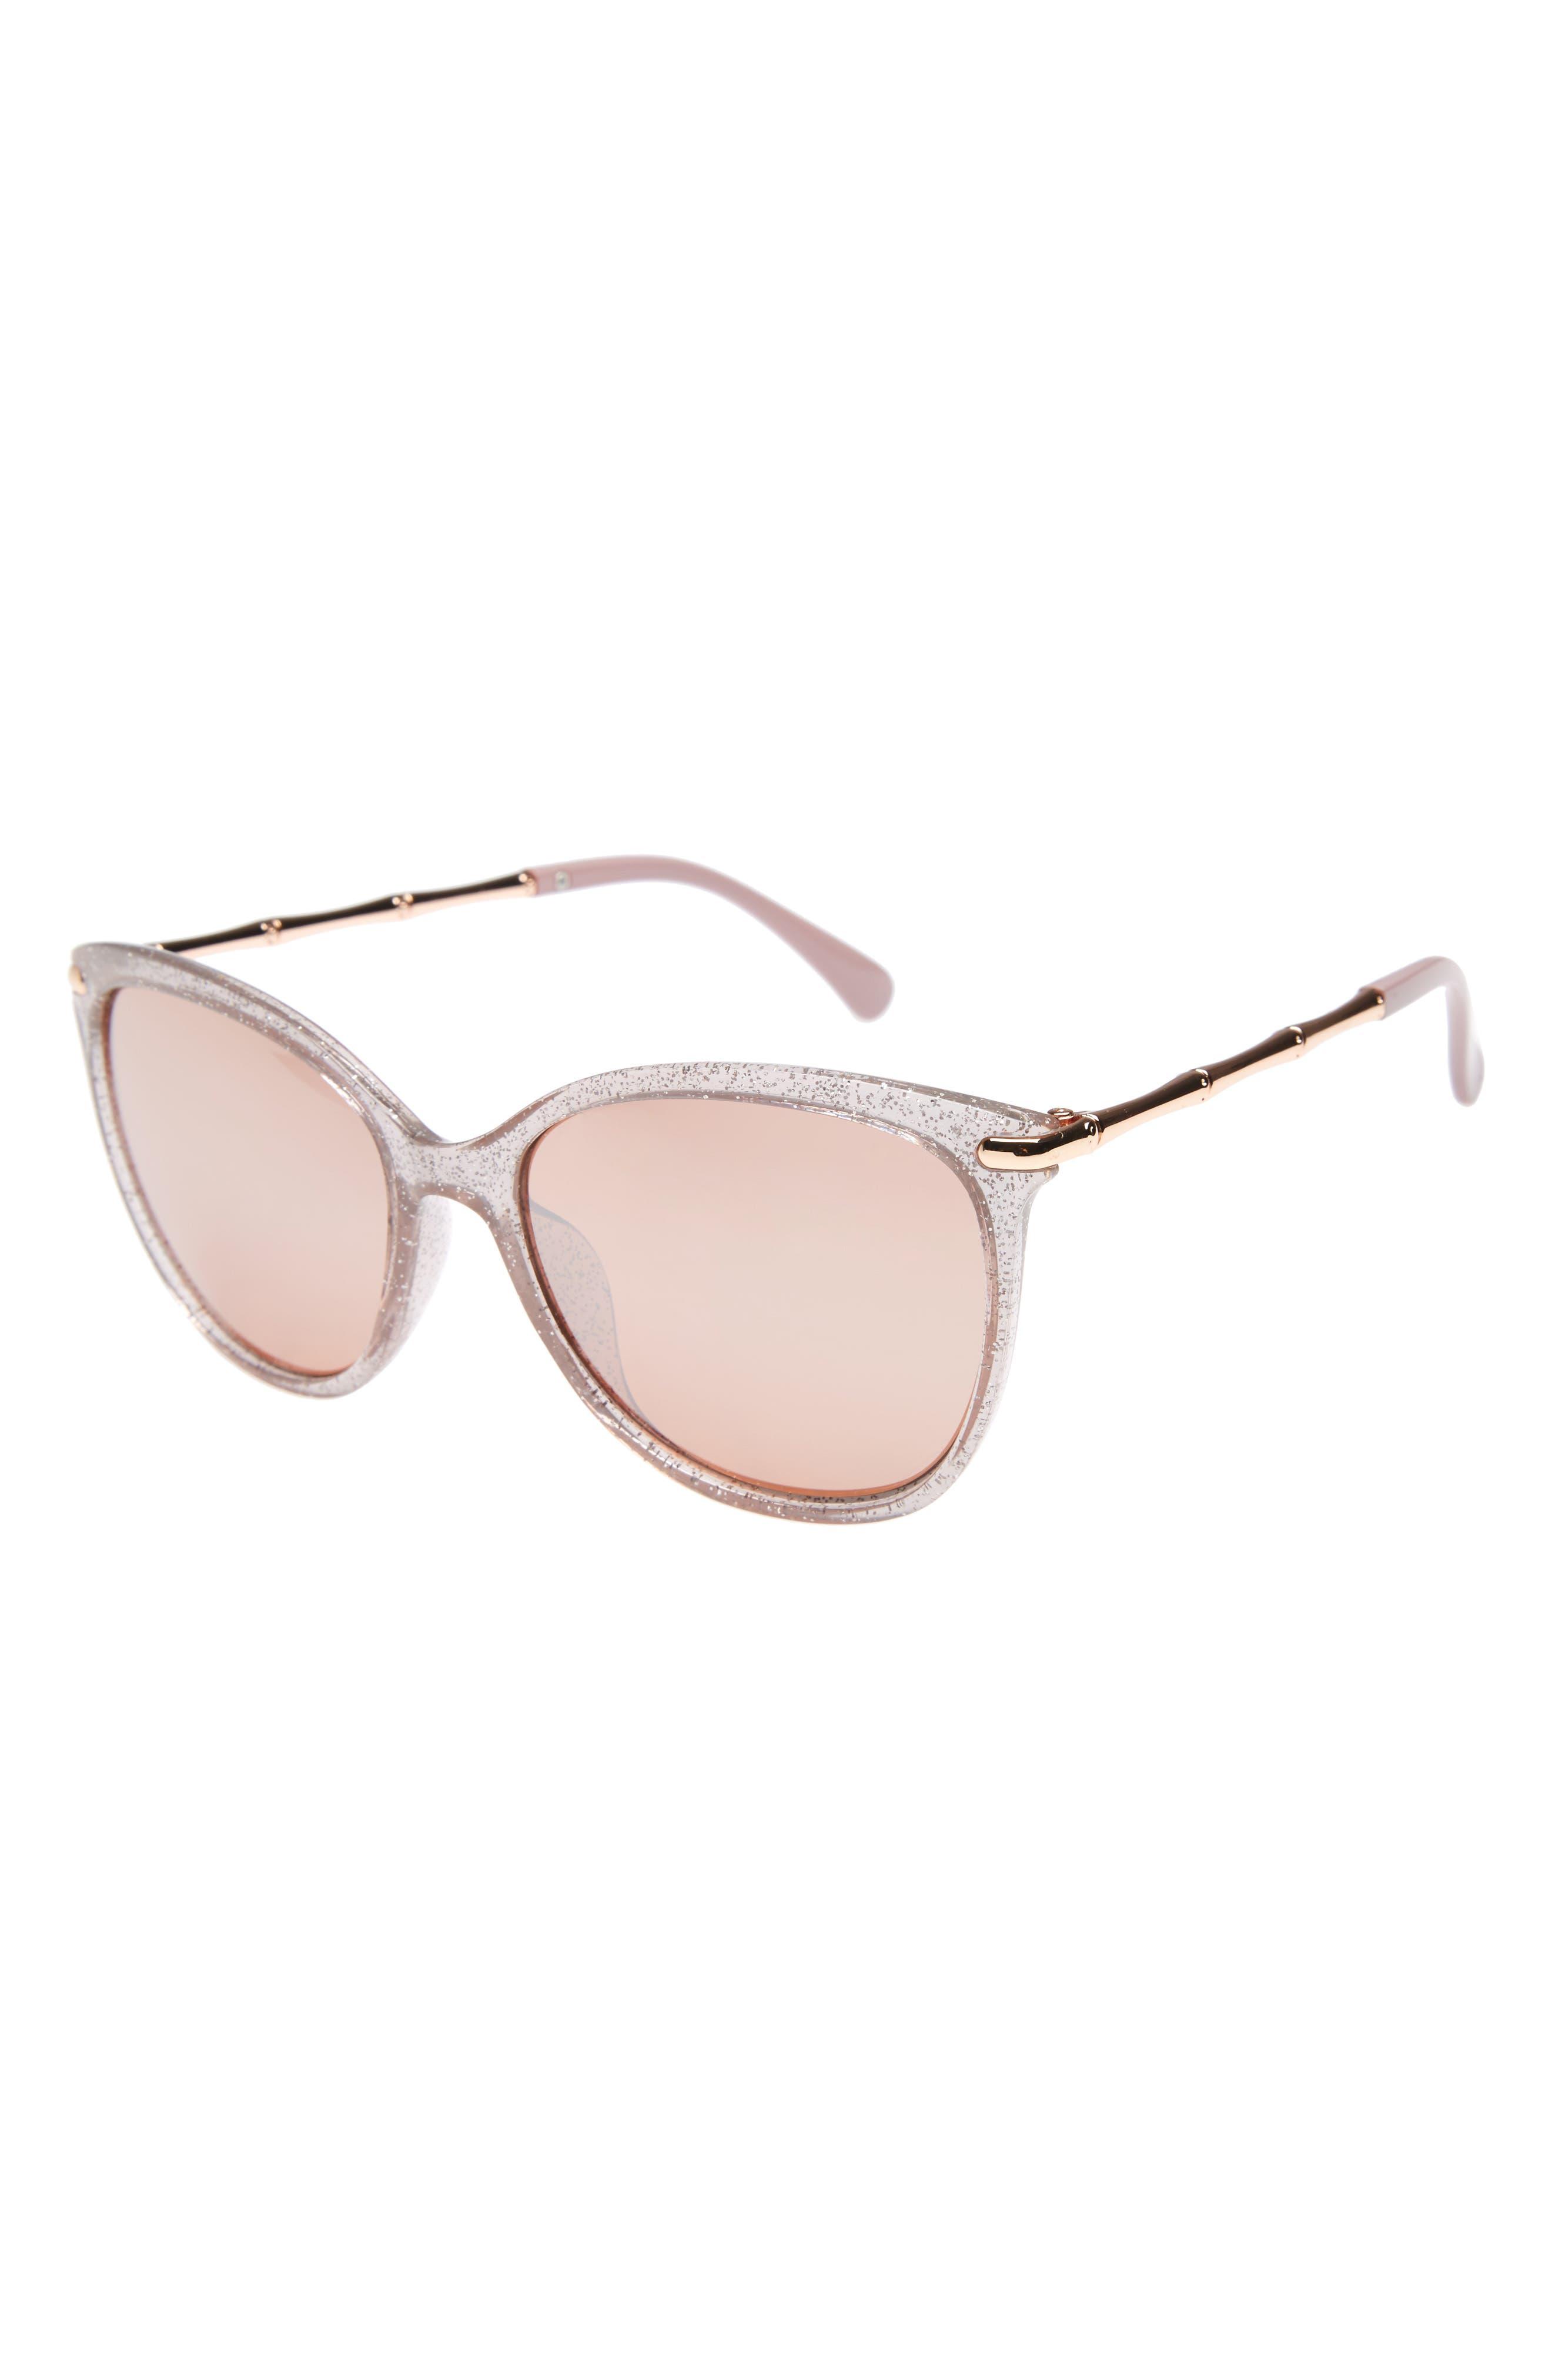 Glitter Sunglasses,                             Main thumbnail 1, color,                             Pink Glitter/ Rose Gold